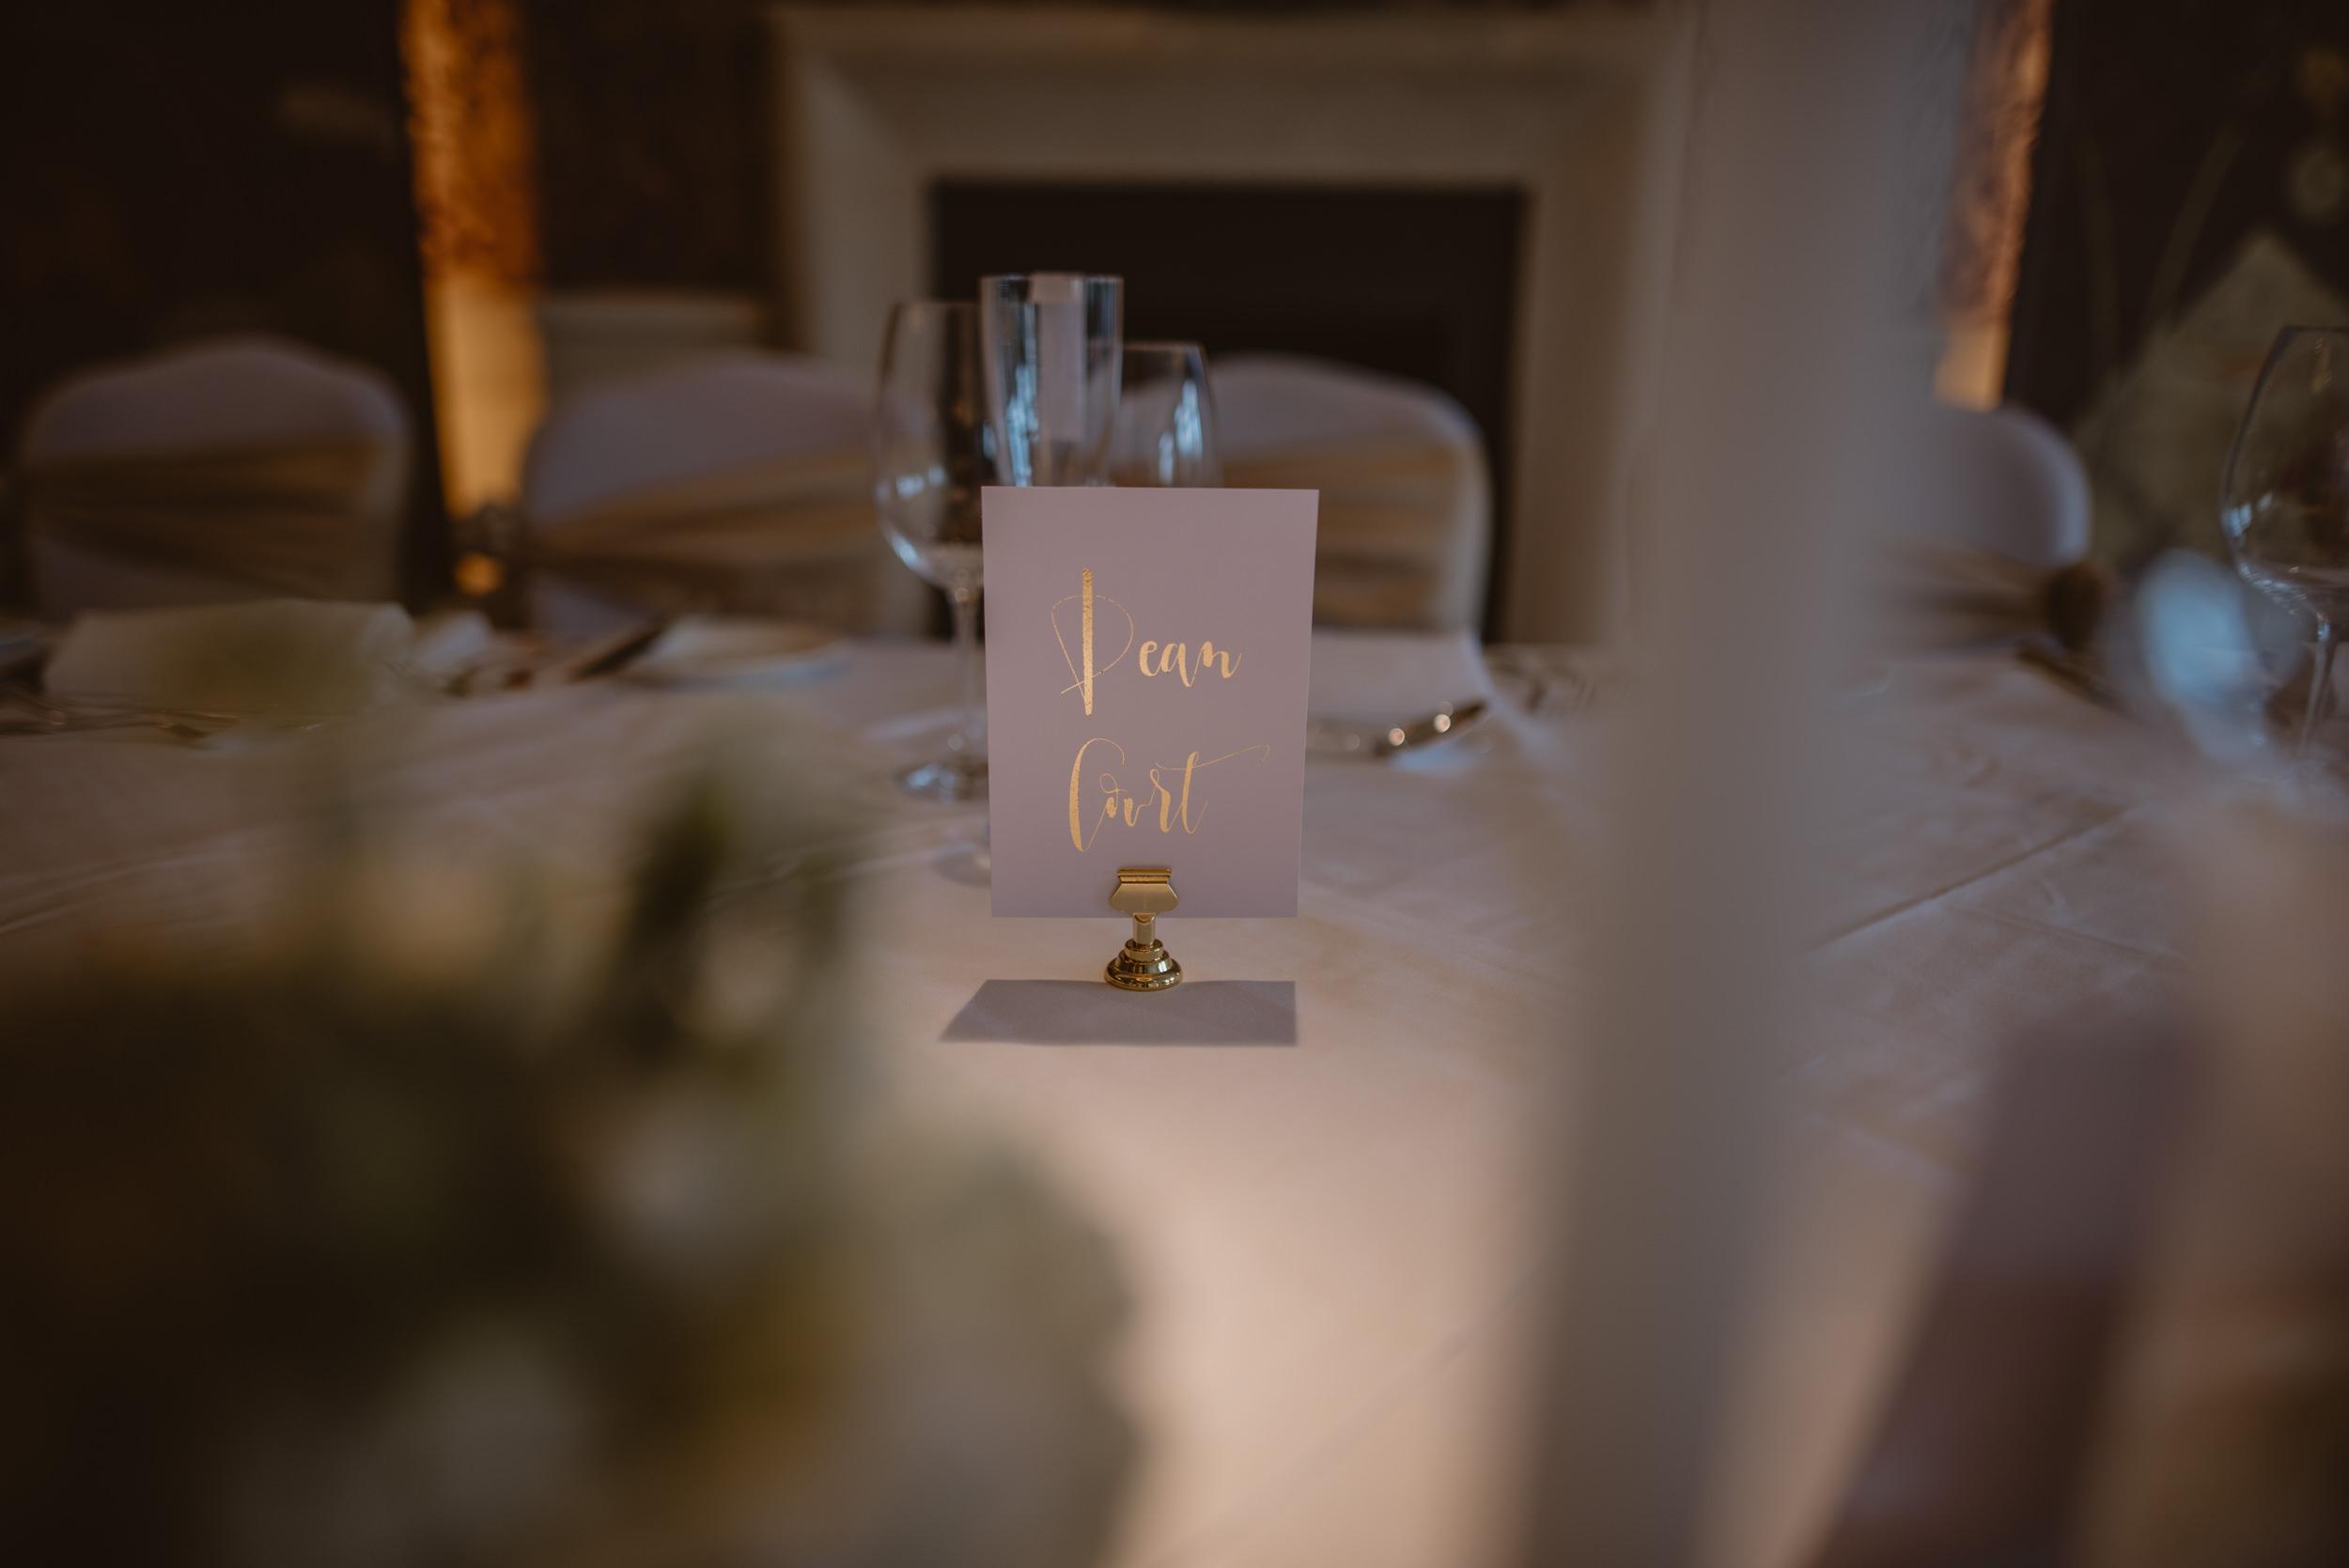 Trisha-and-Roger-wedding-The-Priory-Church-and-Chewton-Glen-Hotel-Christchurch-Manu-Mendoza-Wedding-Photography-267.jpg